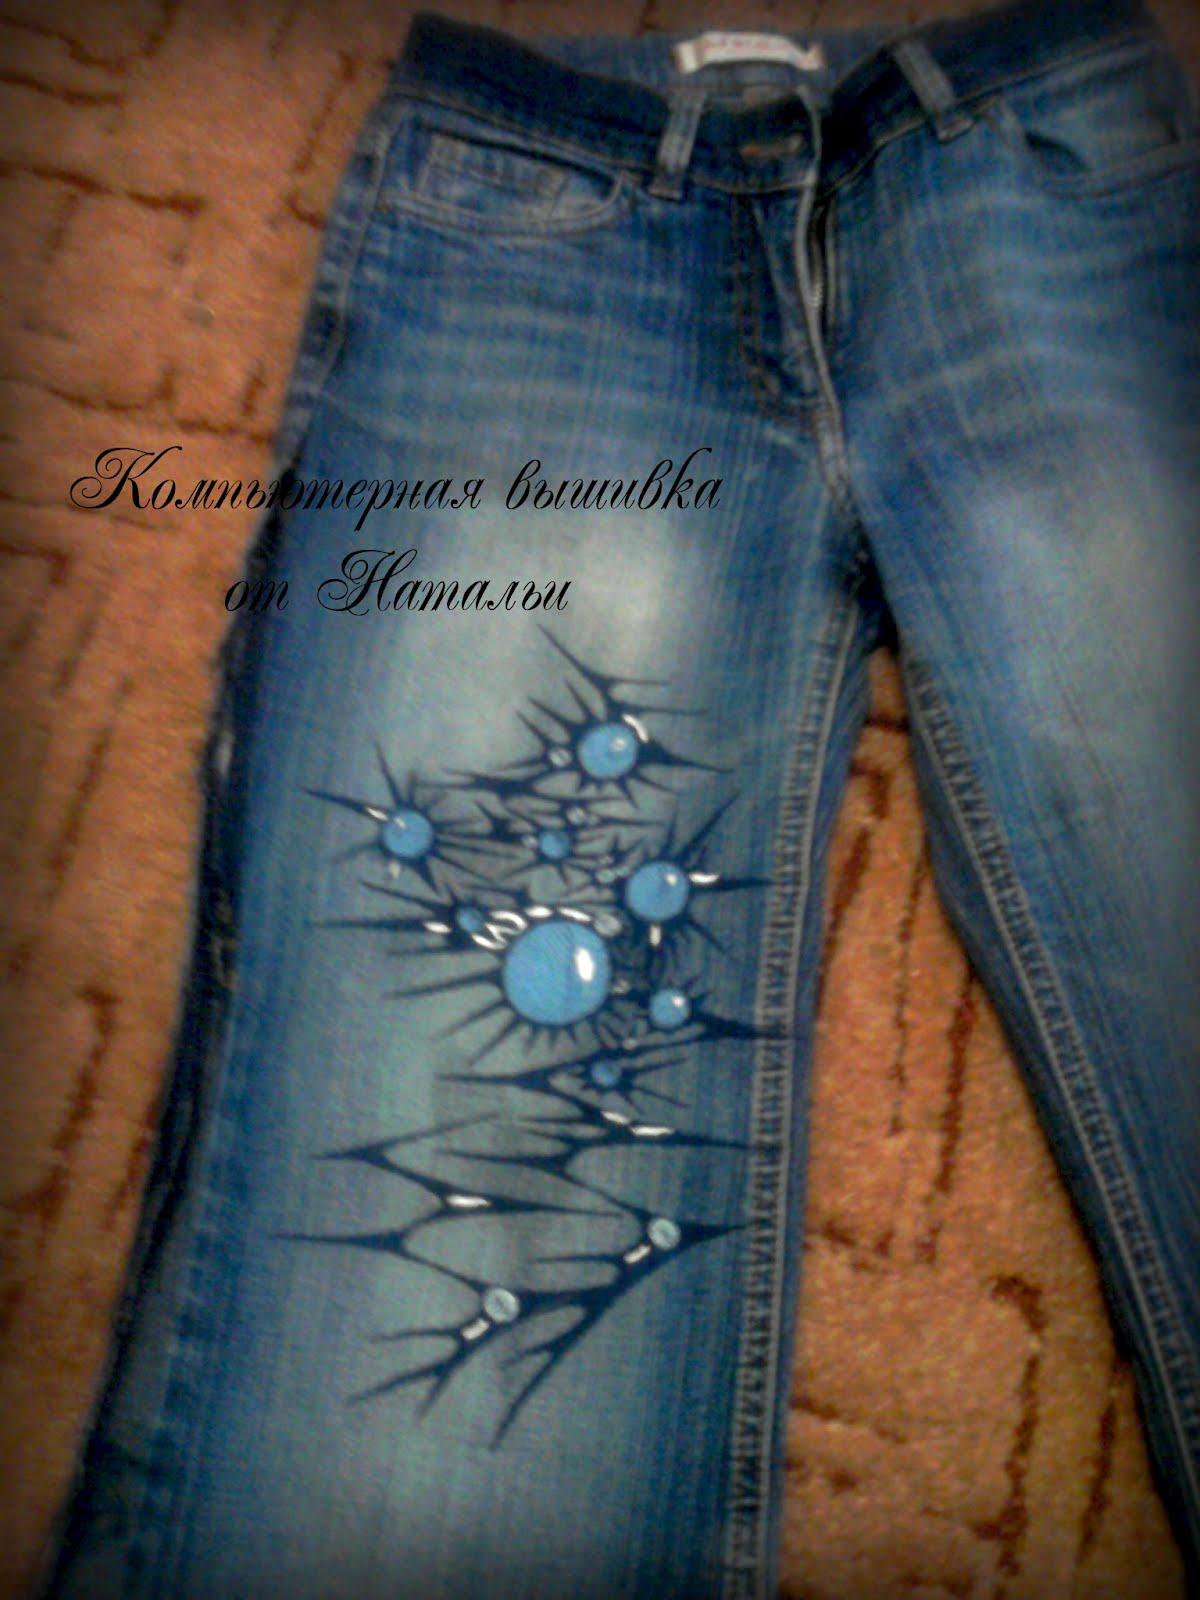 Вышивка на коленке джинс 82